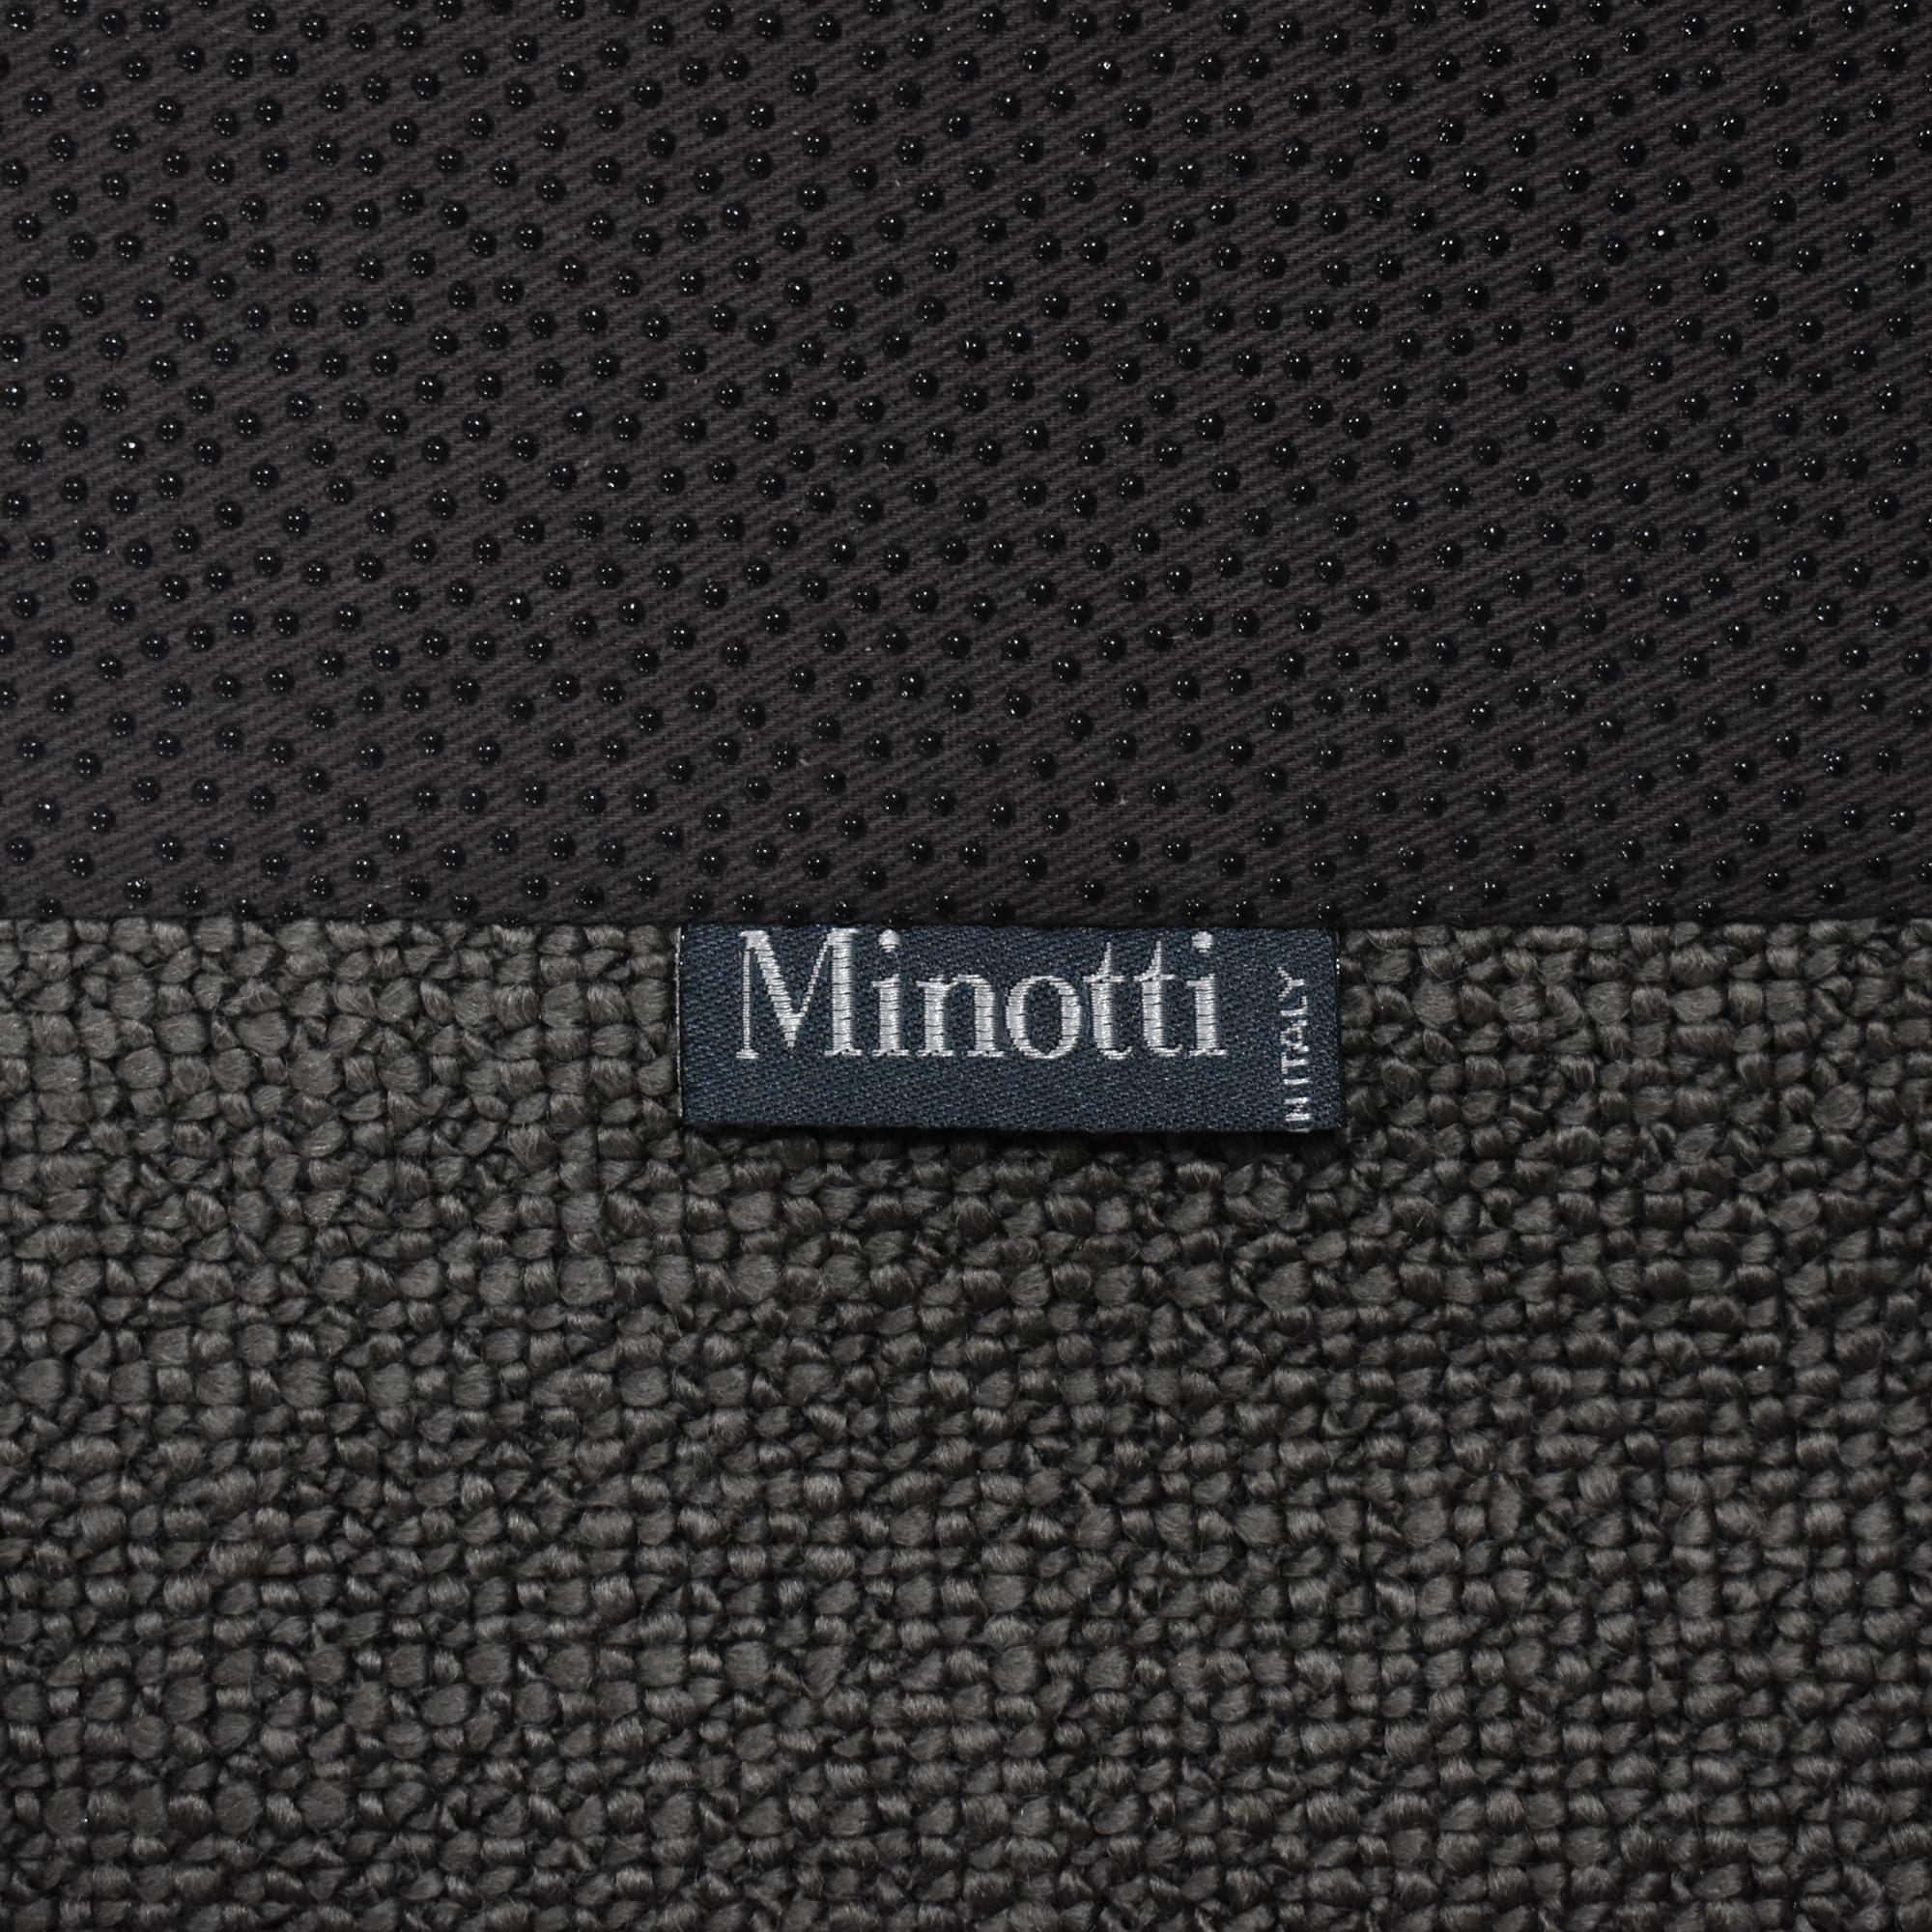 Minotti Minotti Hamilton Islands Sectional Sofa dimensions